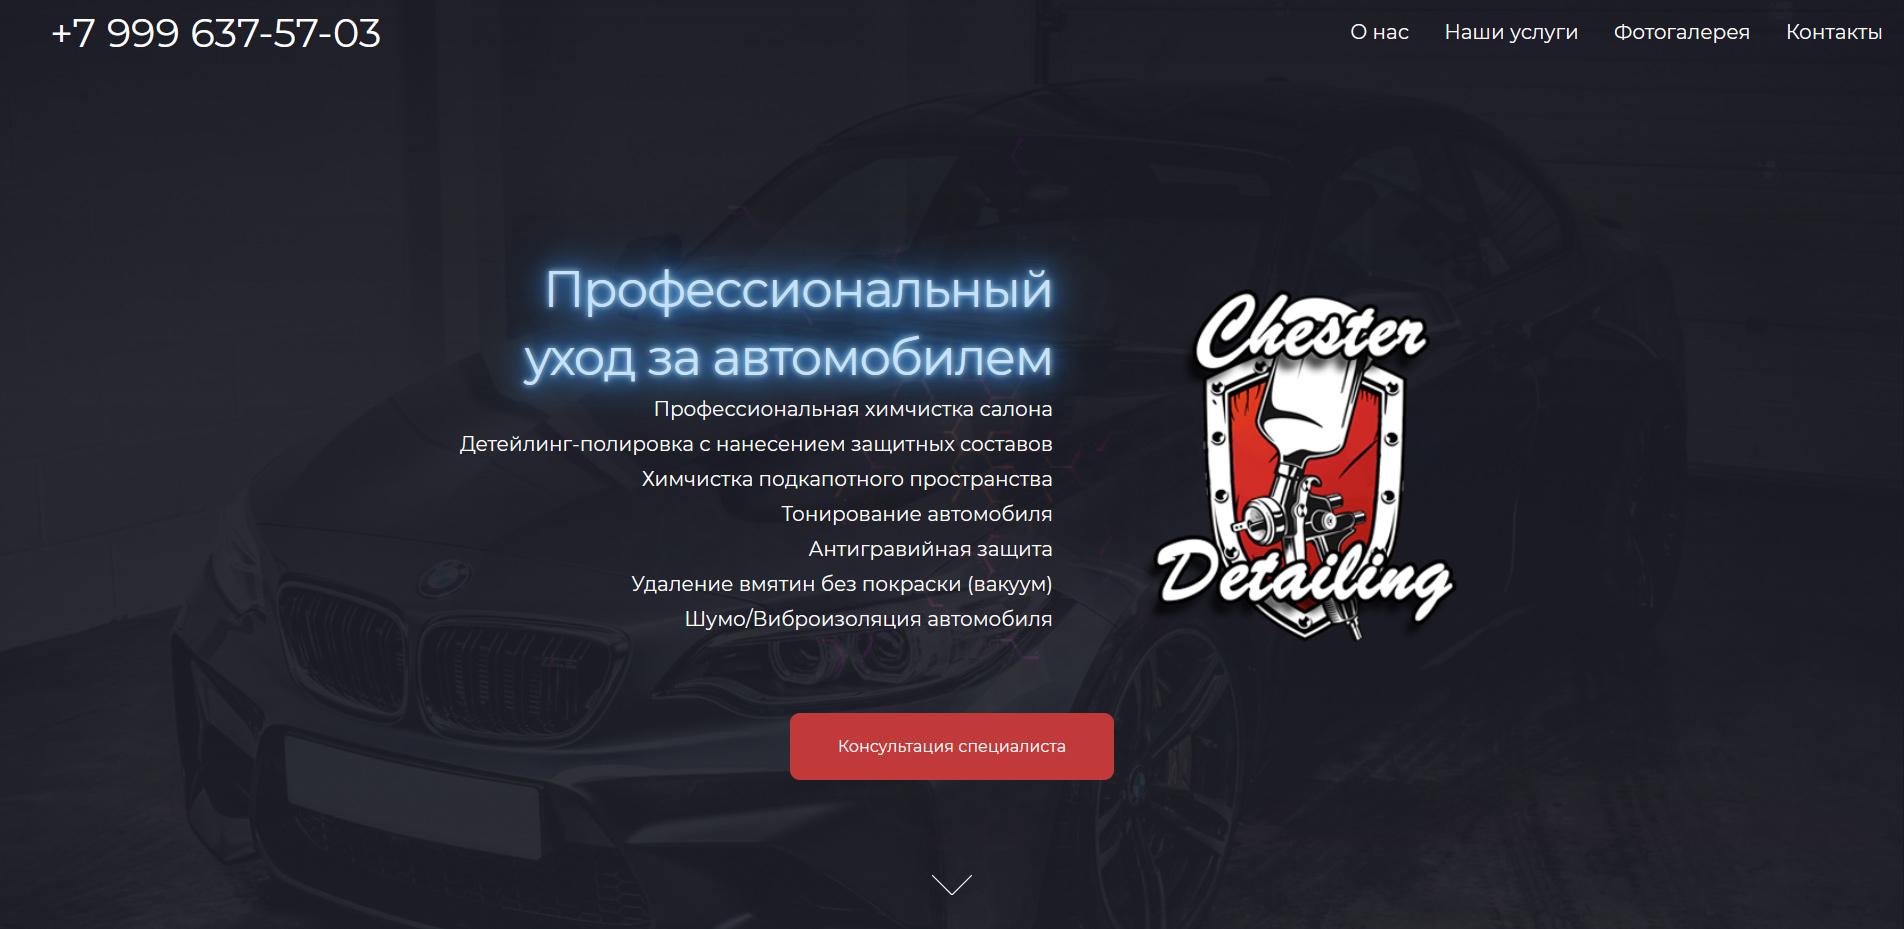 Химчистка салона — chesterdetailing.ru